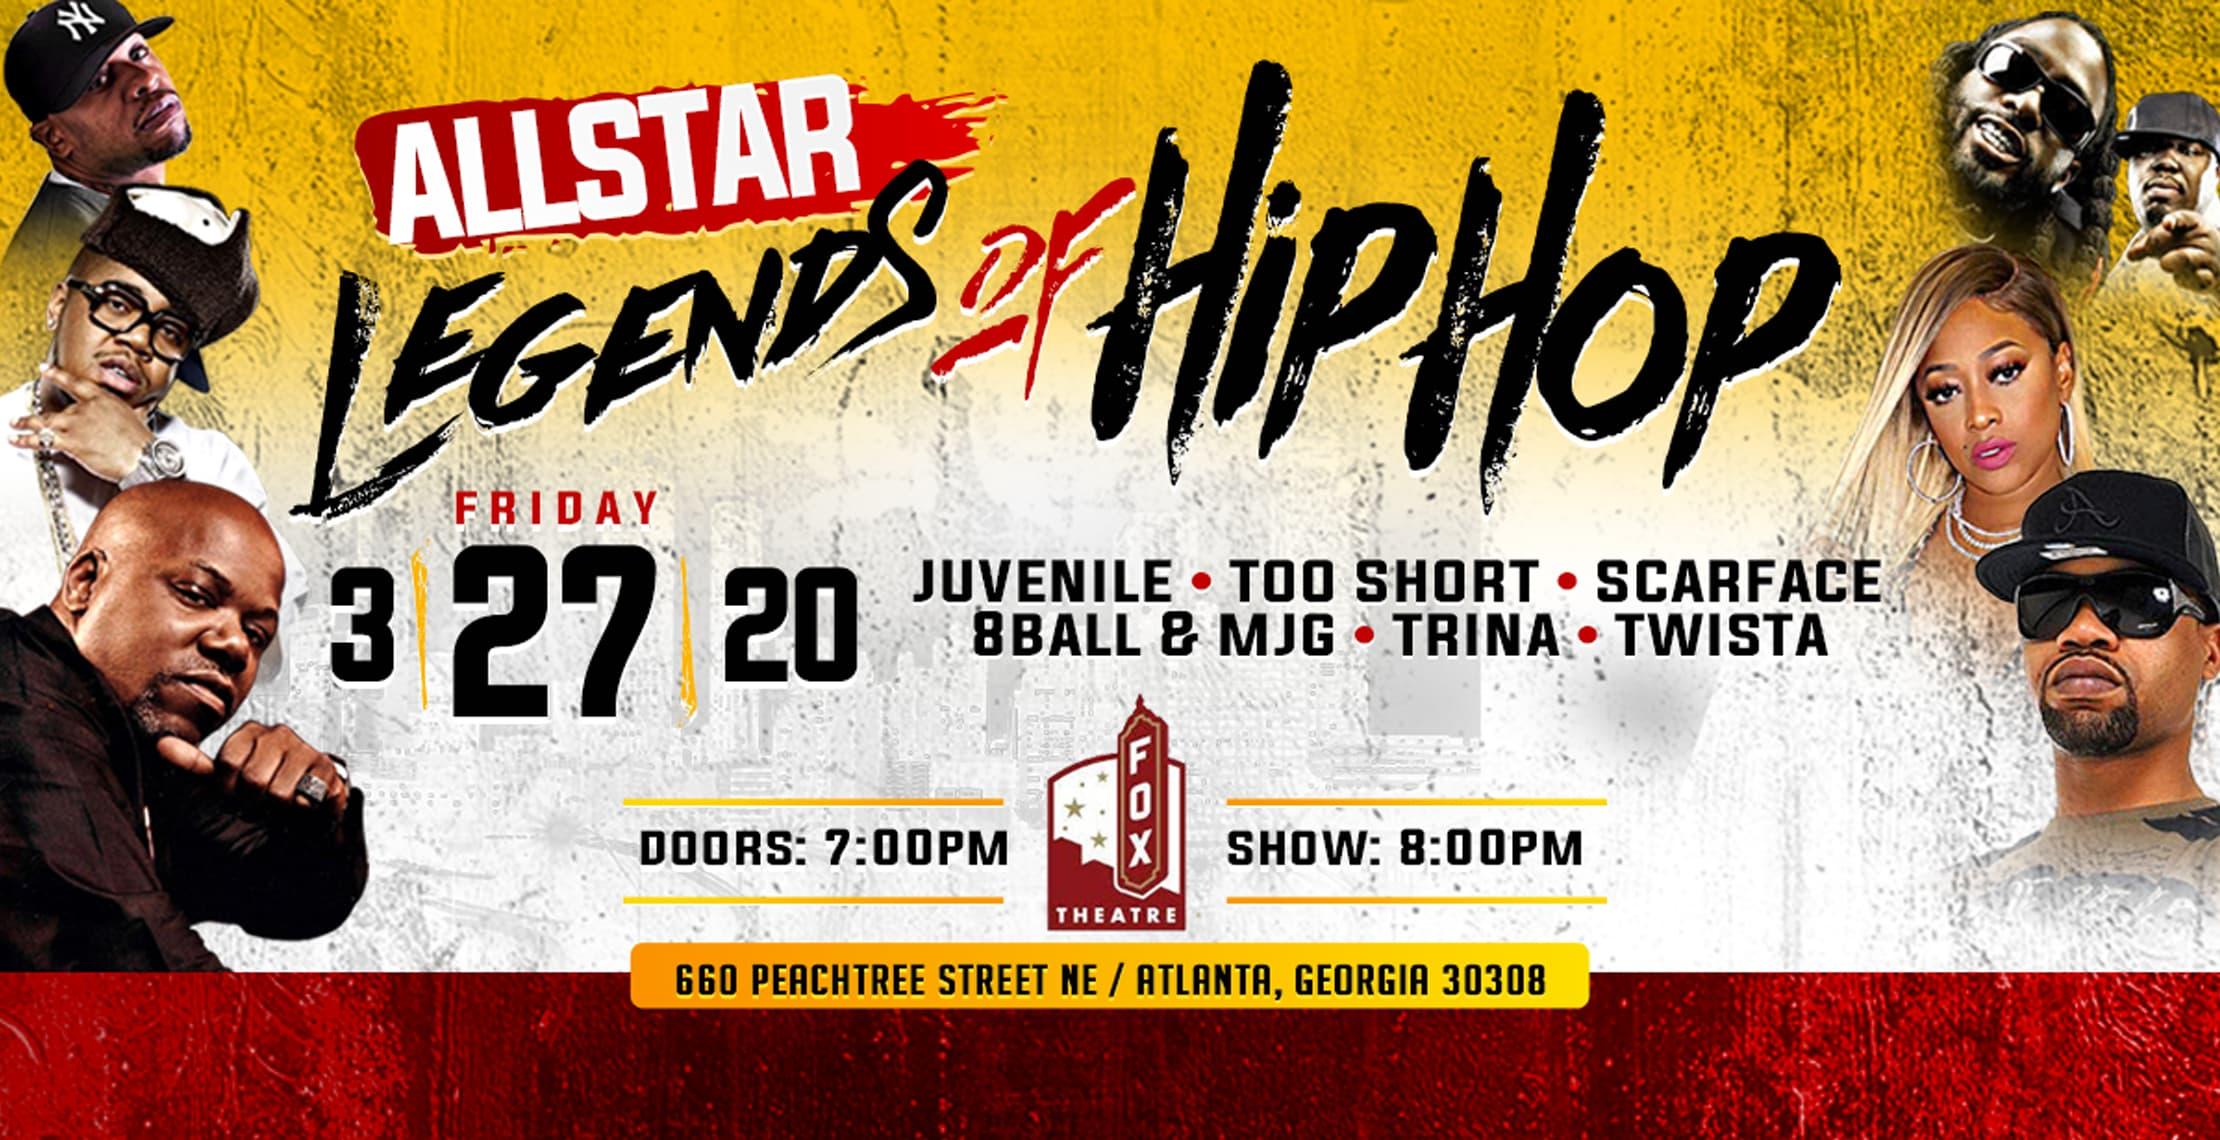 AllStar Legends of Hip Hop